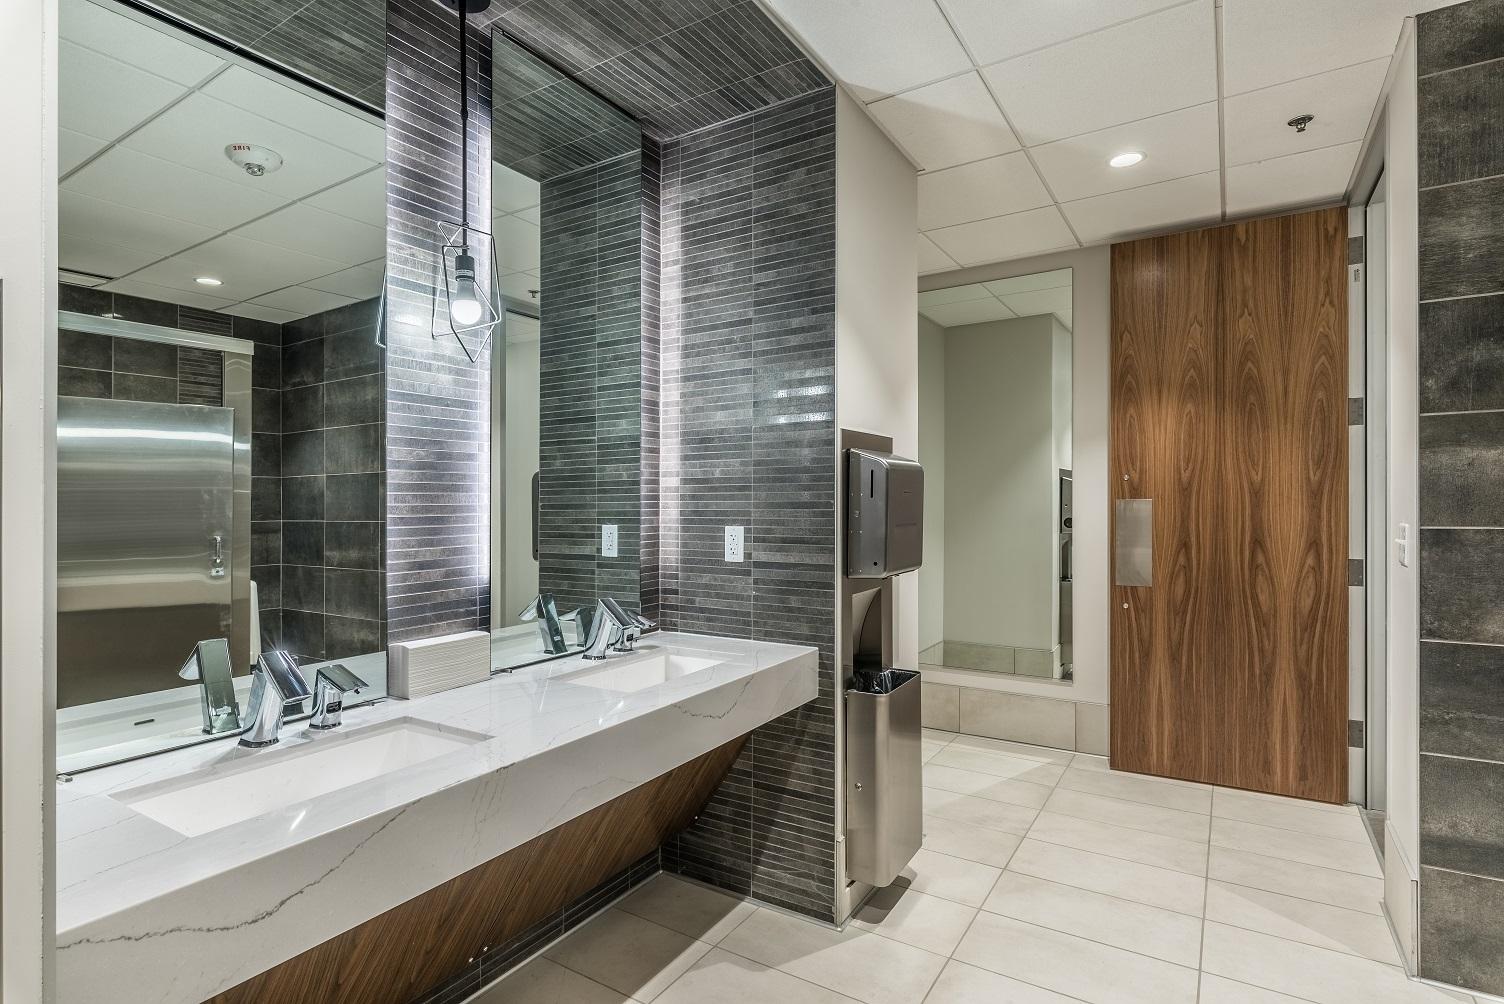 6th_floor_restroom-25